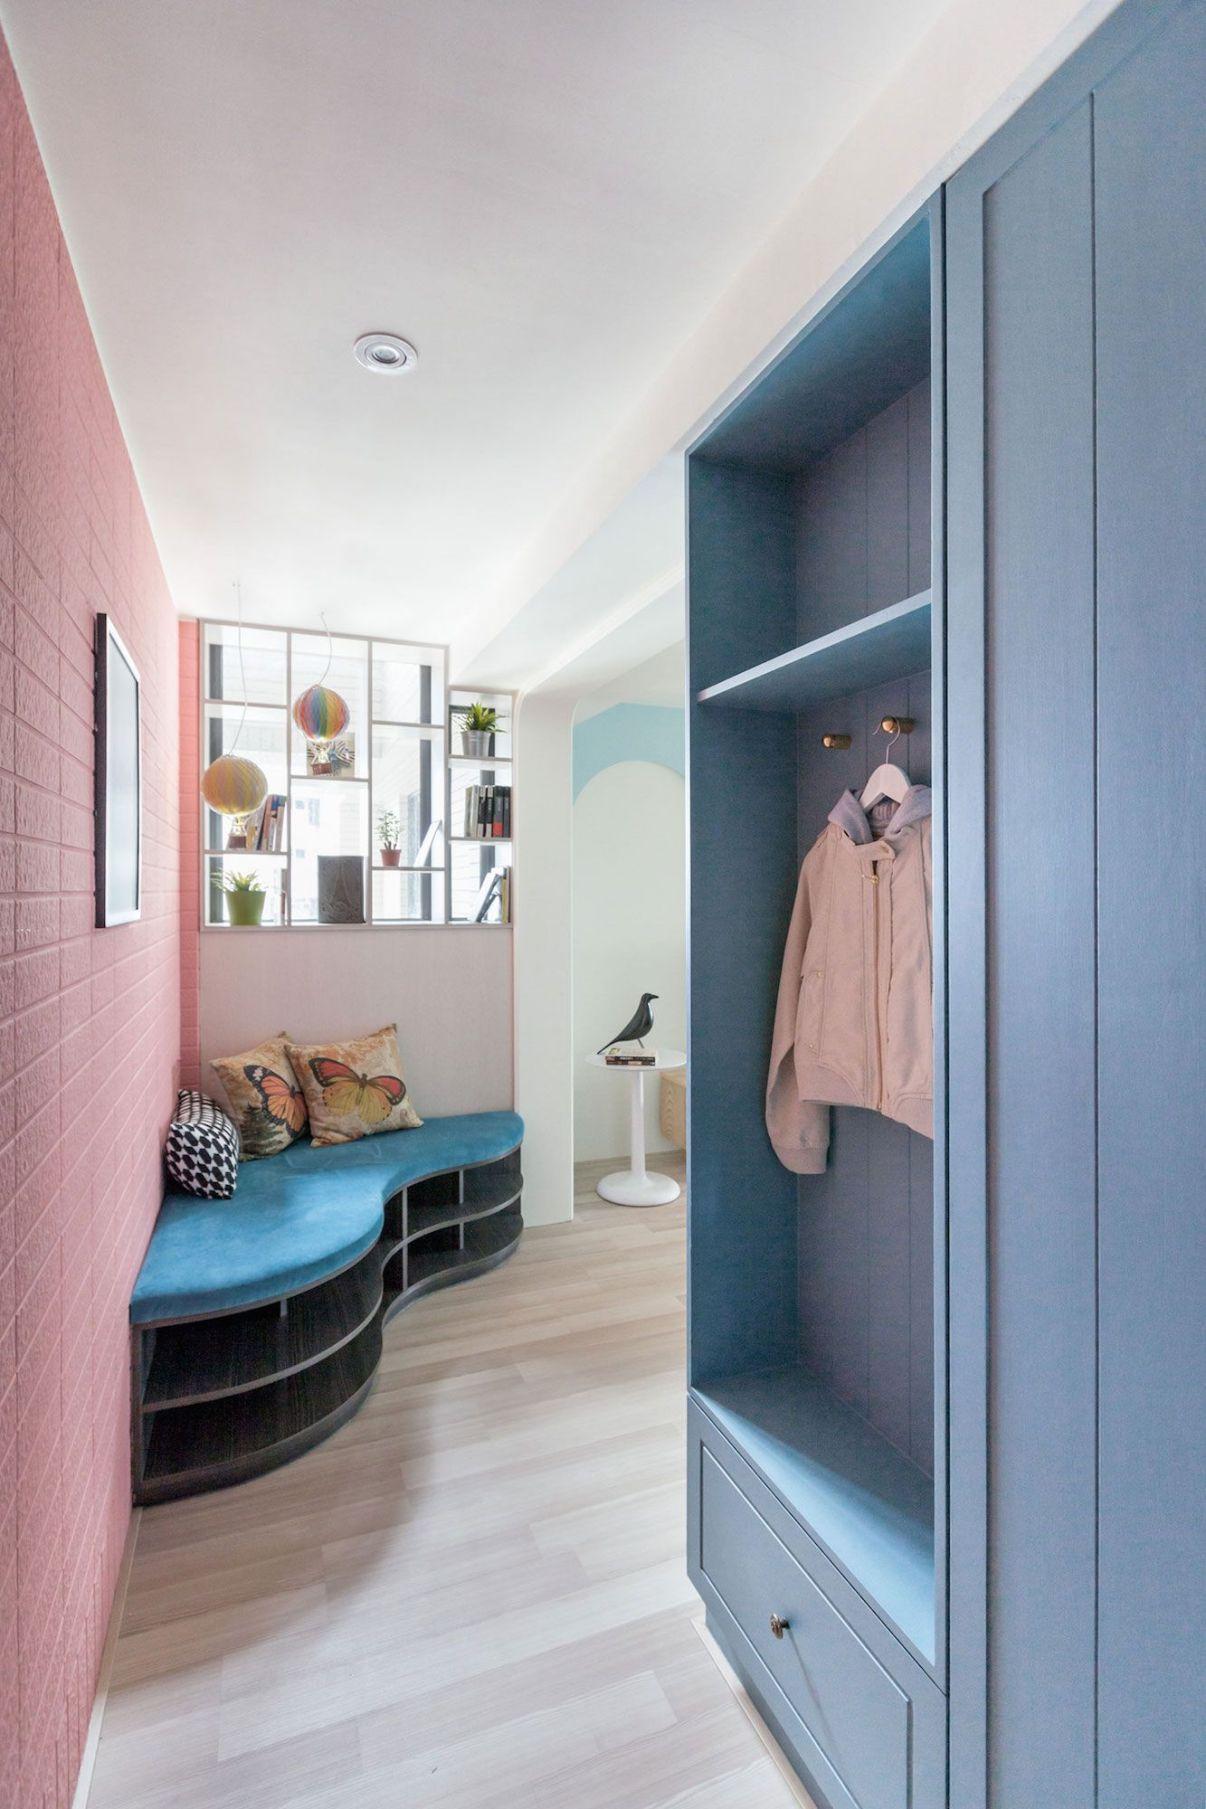 wonderland-apartment-by-house-design-studio-0.jpg